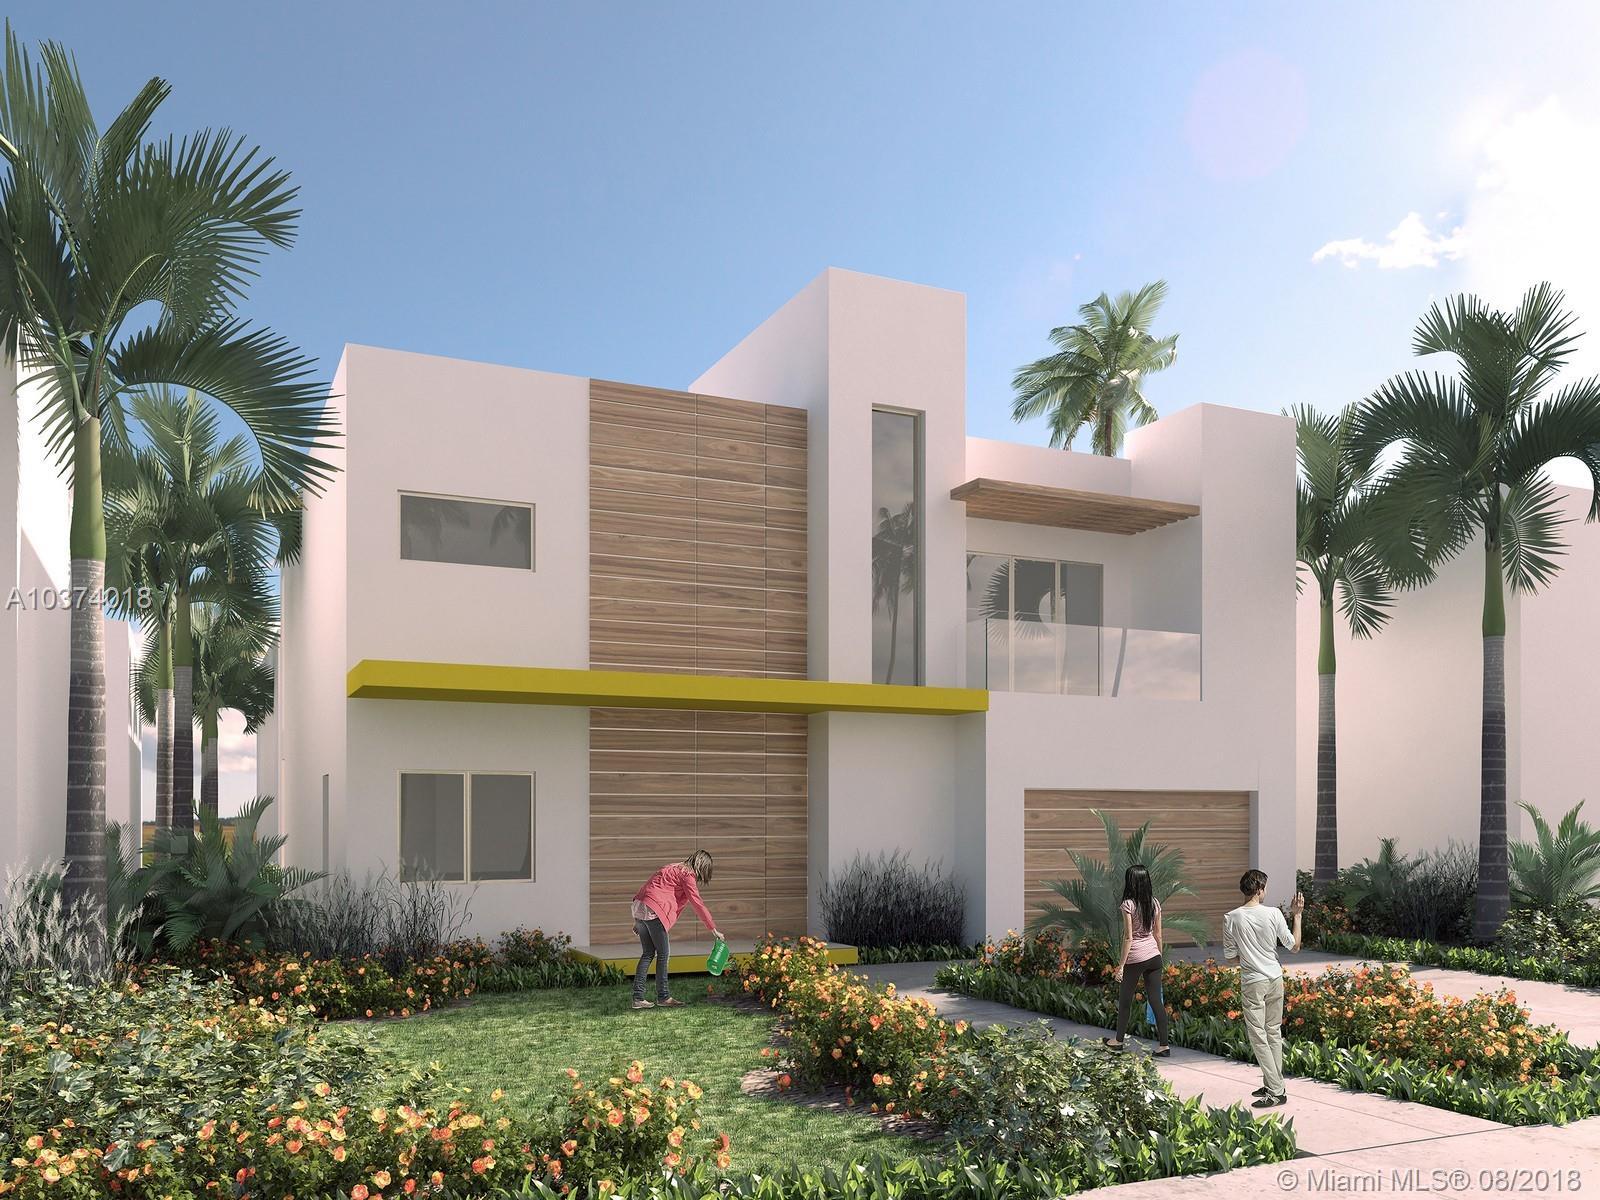 271 191 St, Sunny Isles Beach FL, 33160